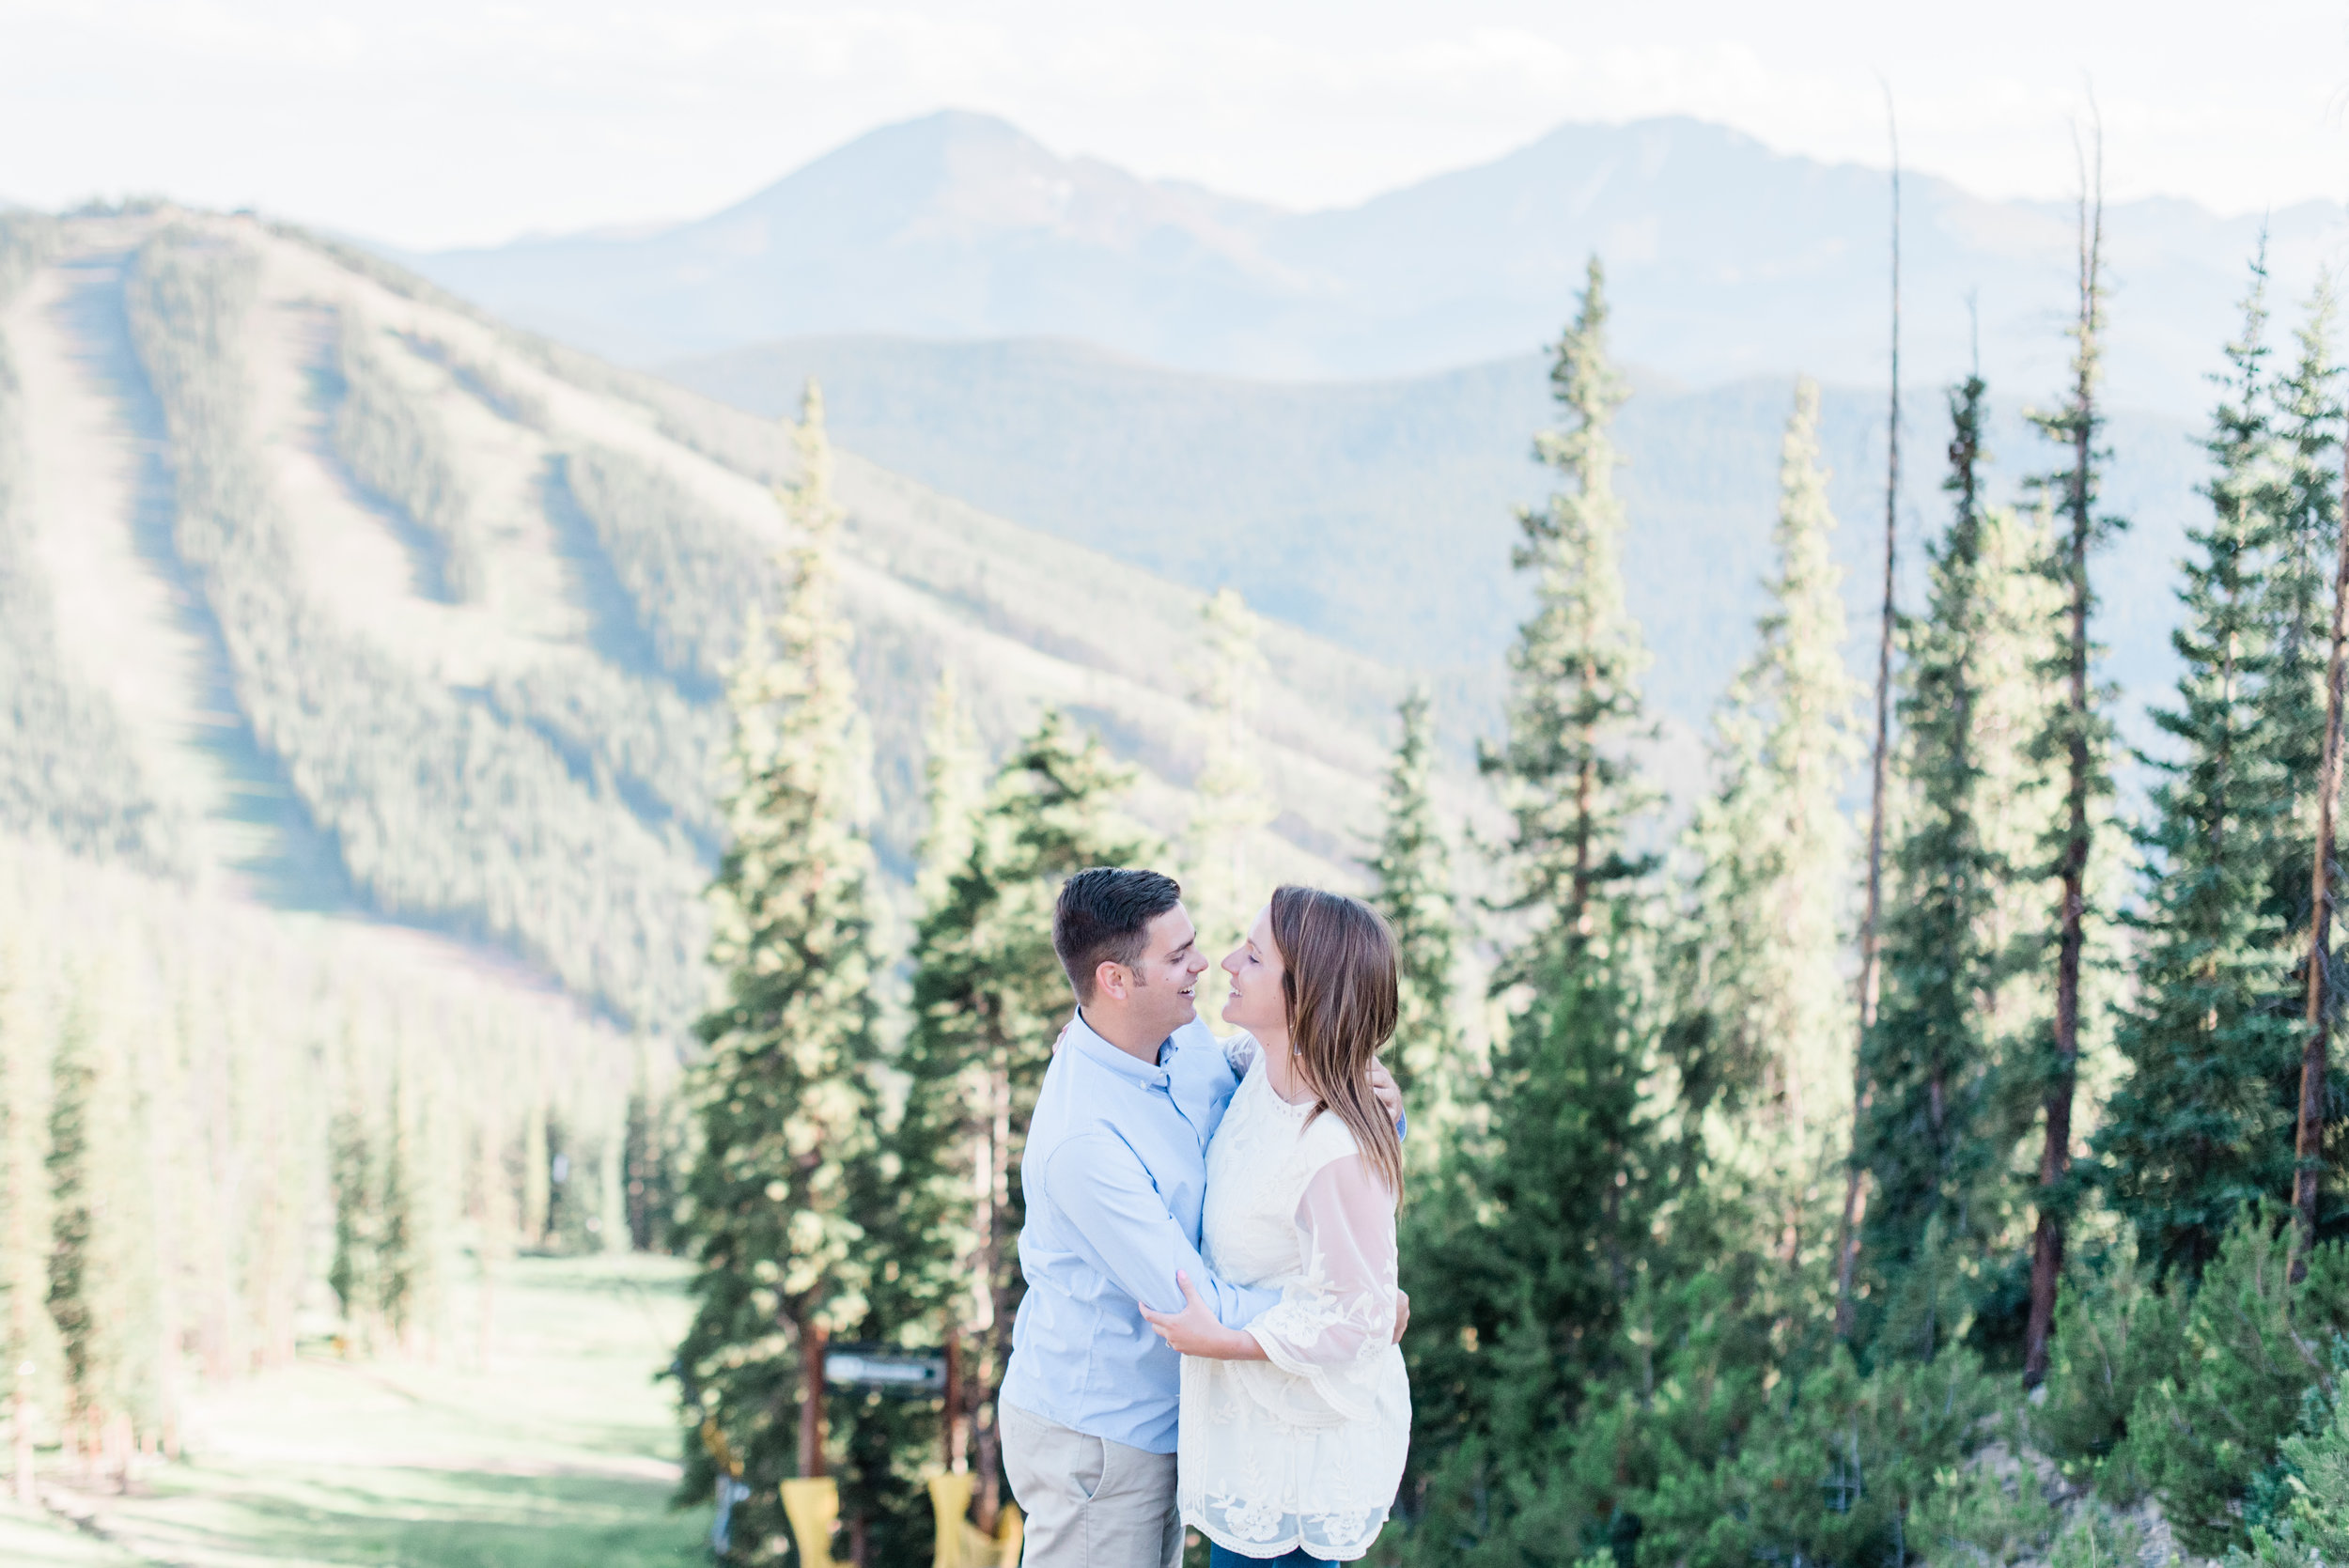 AshleighMillerPhotography-Adventure-Photography-Session-Elle-Christian-Colorado-18.jpg